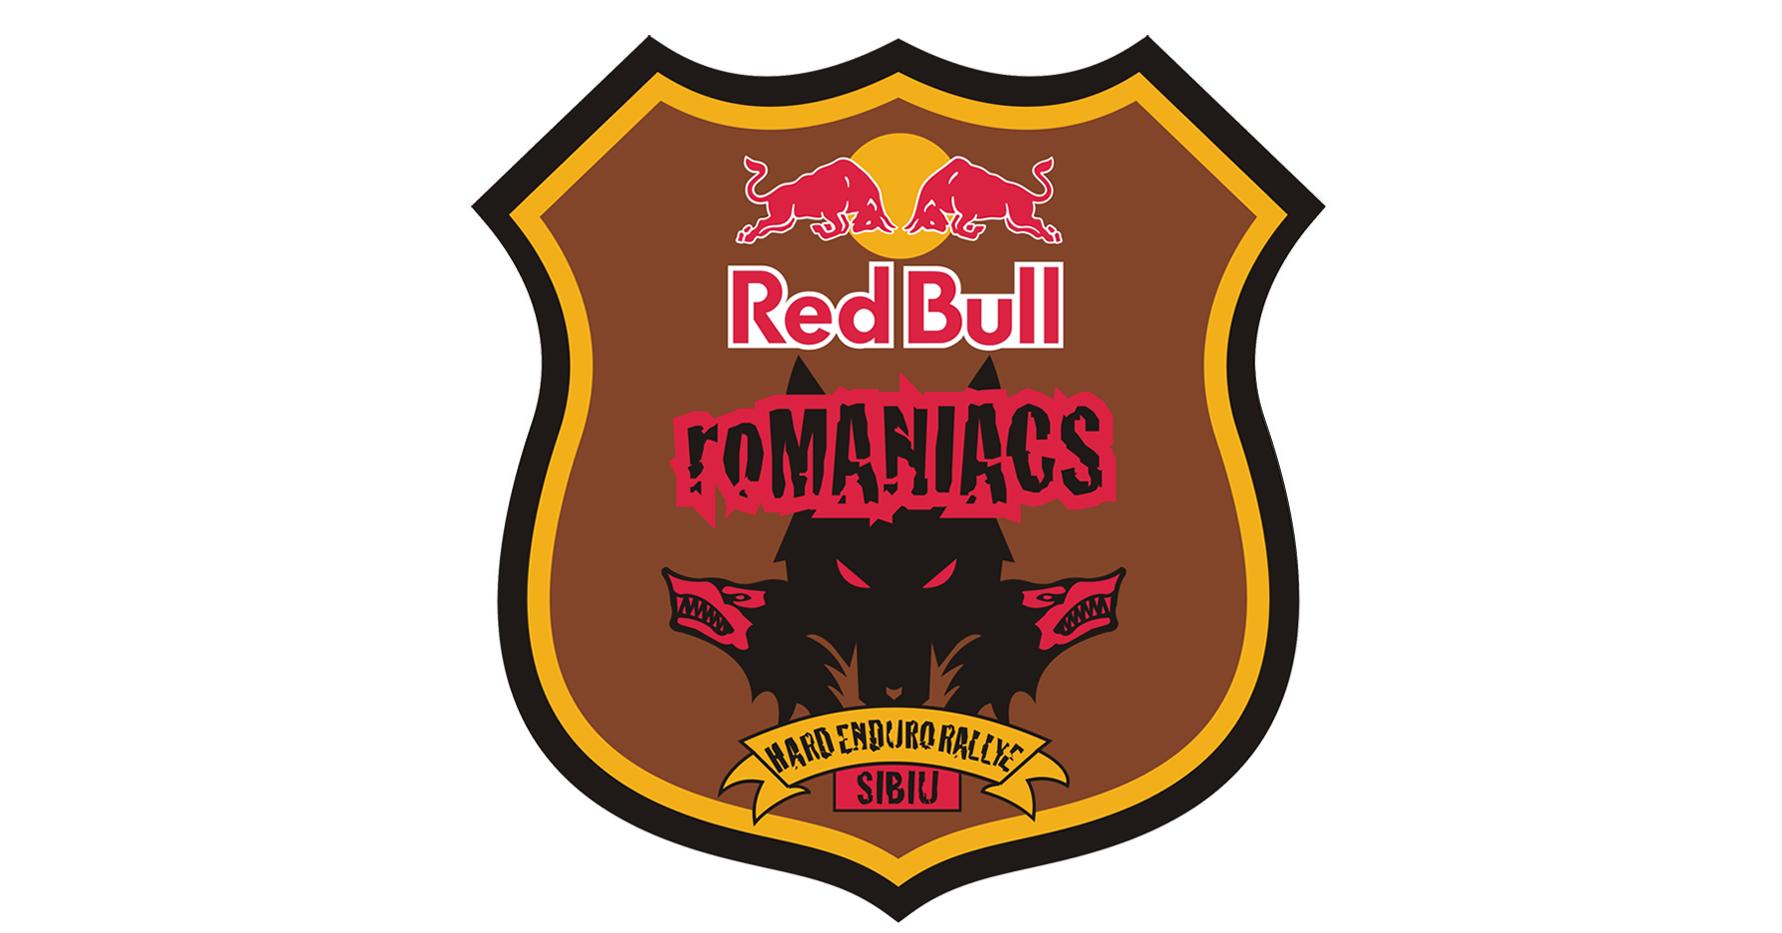 Red Bull clipart rbr Prolog